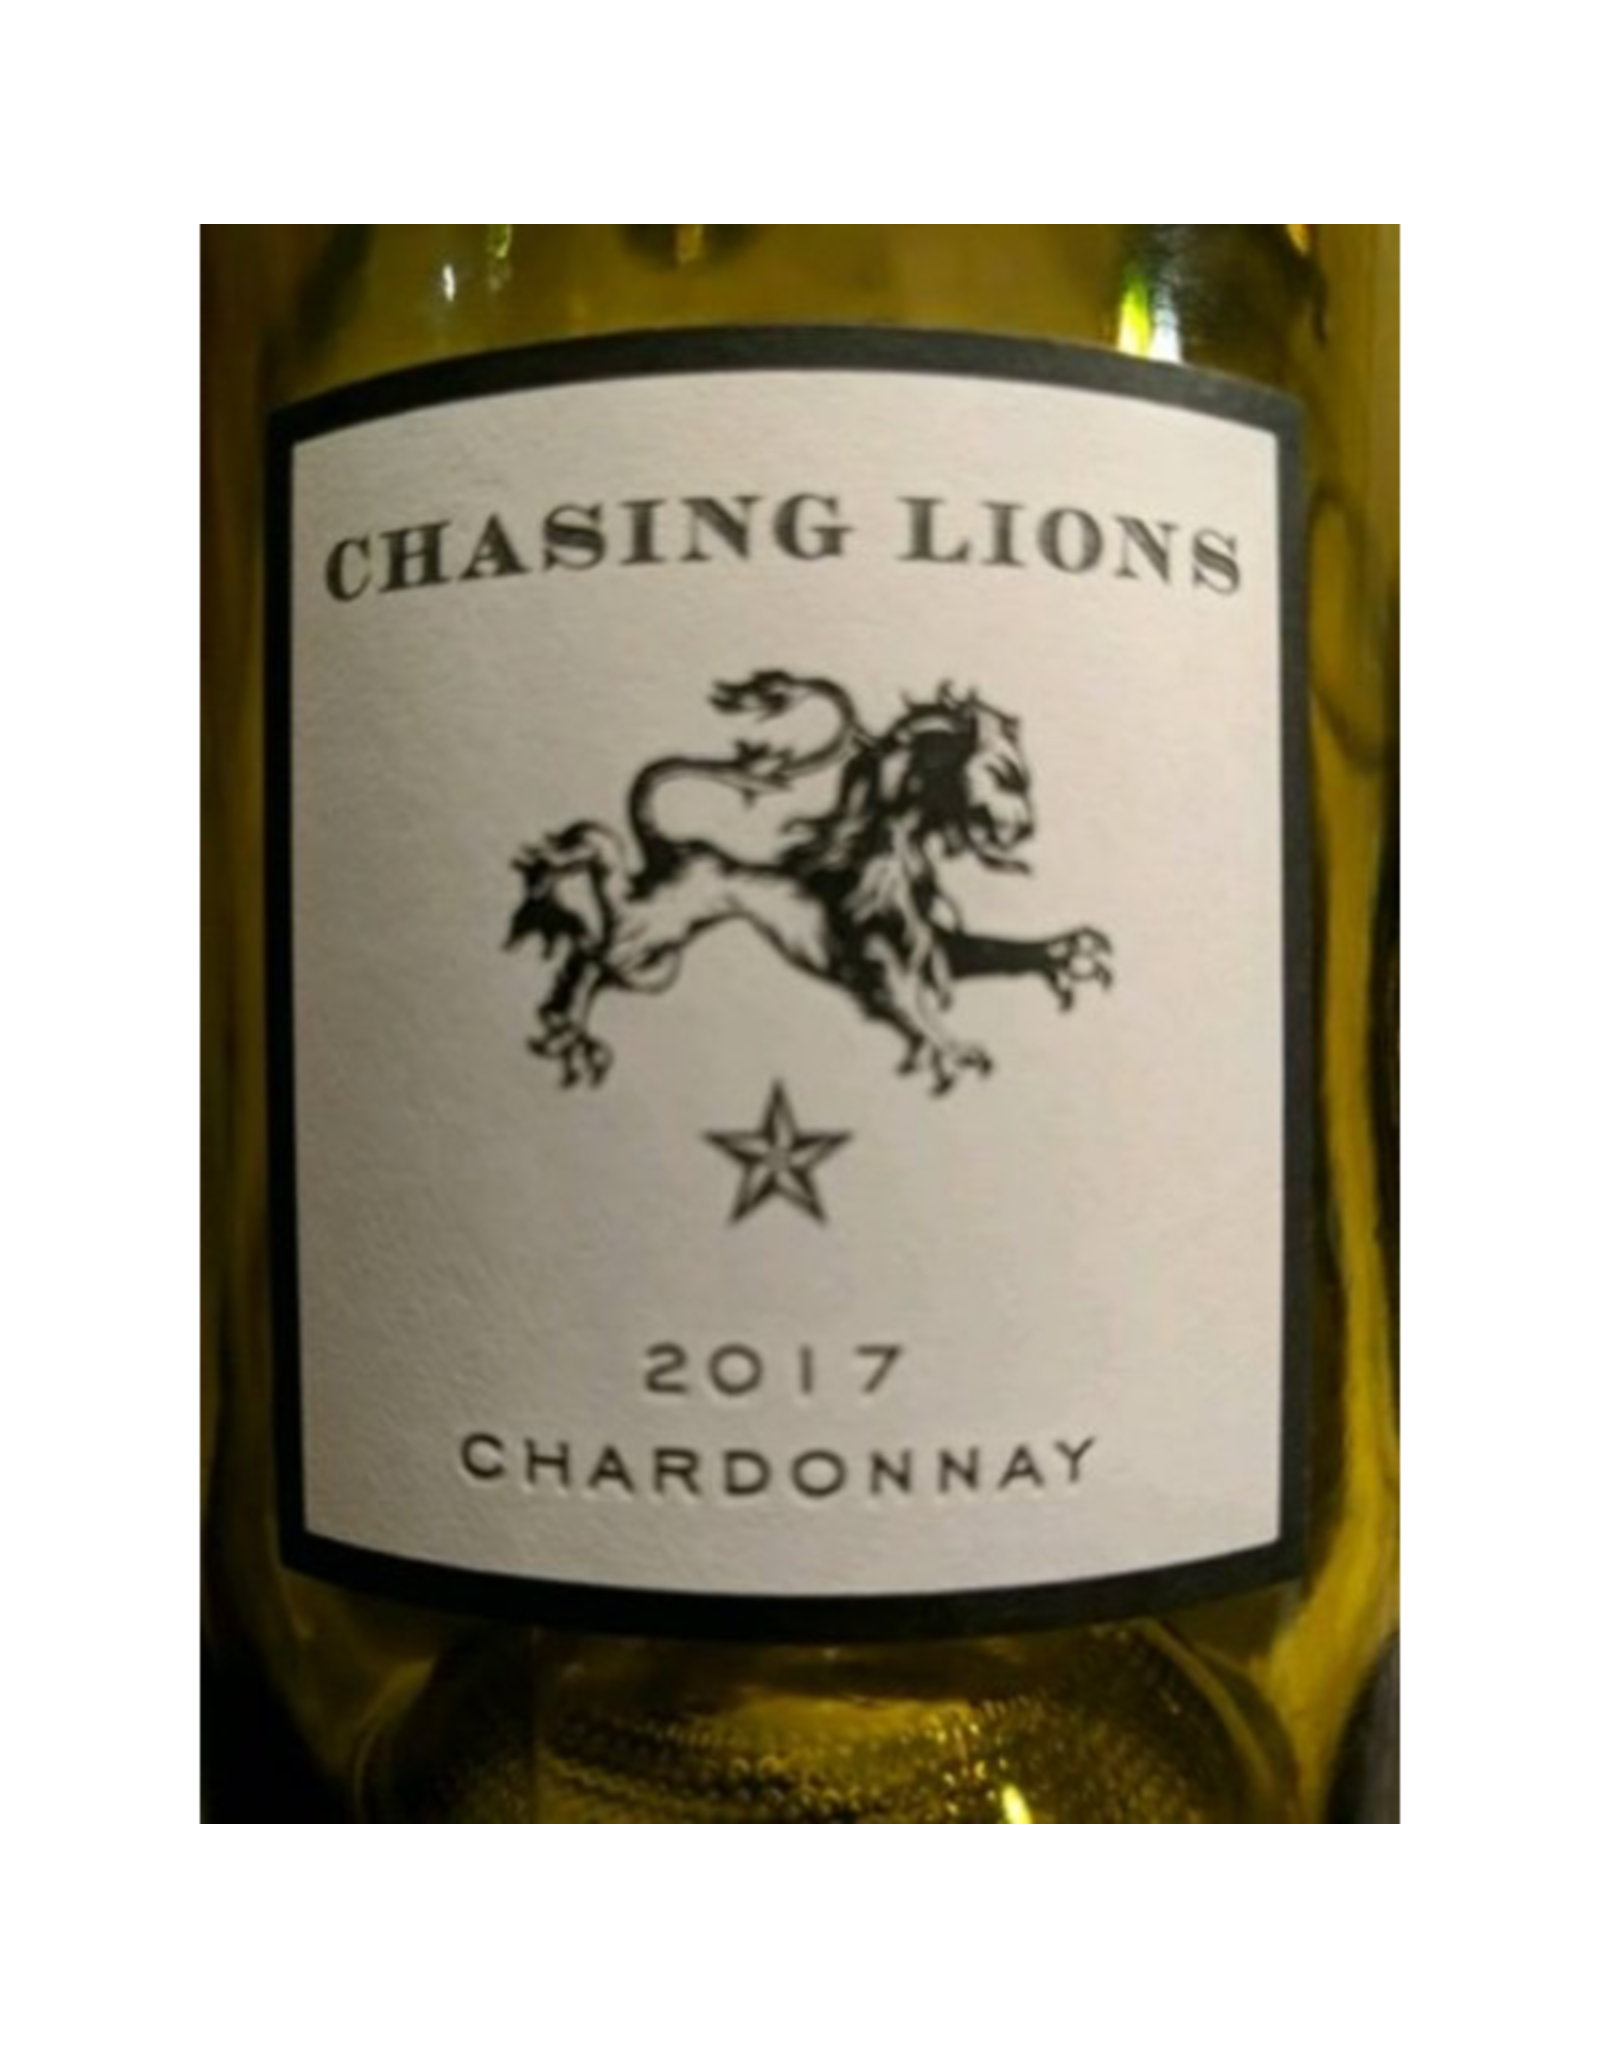 CHASING LIONS 2017 CHARDONNAY 750ML